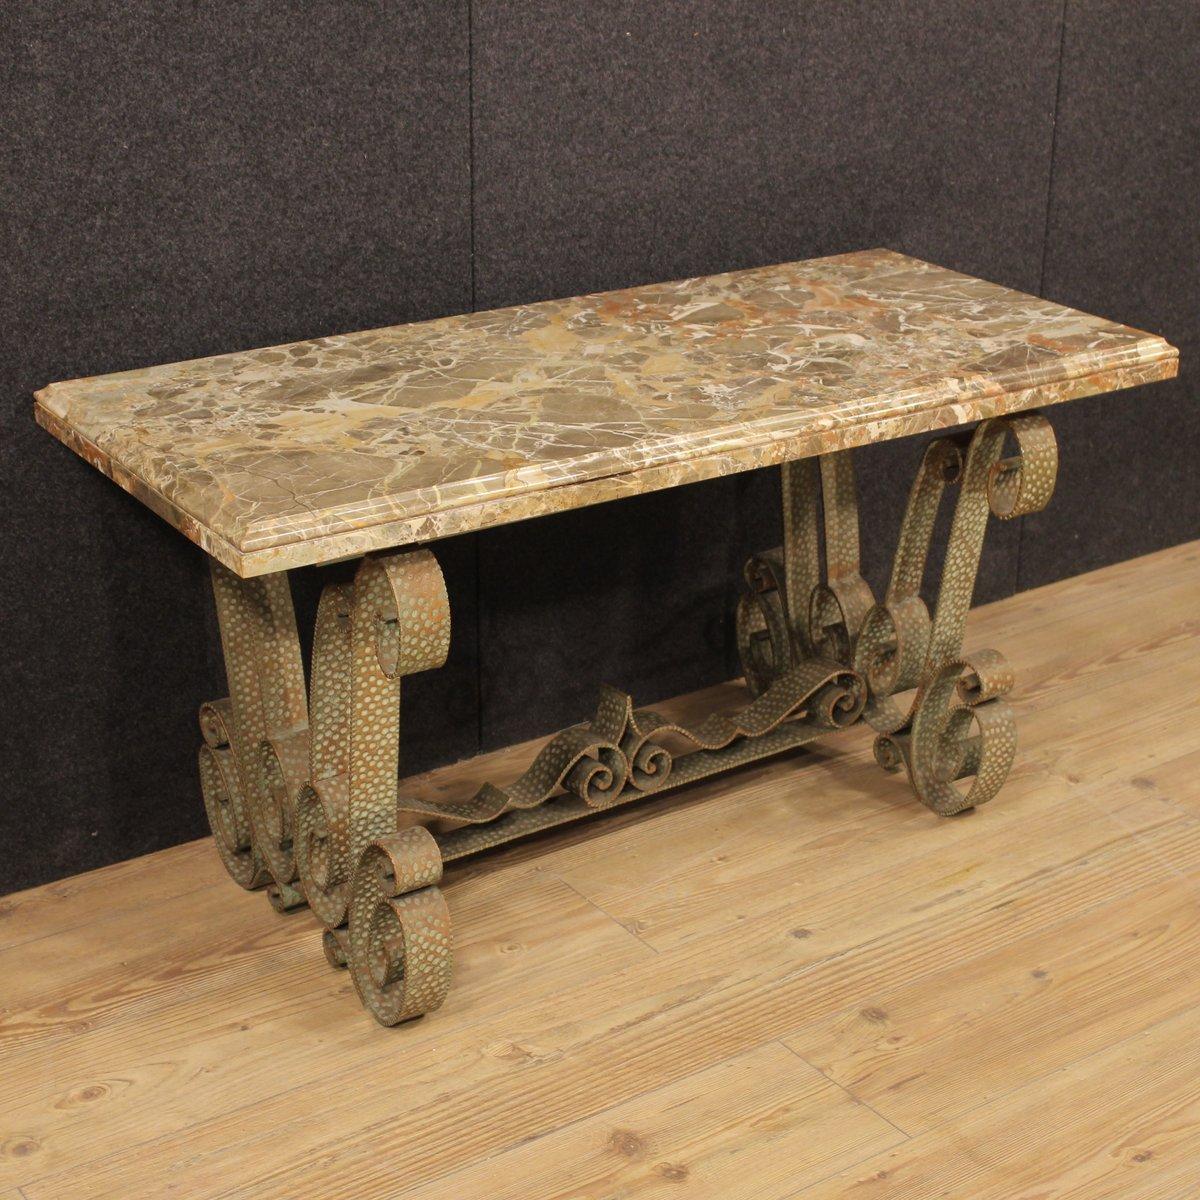 table basse vintage en marbre italie en vente sur pamono. Black Bedroom Furniture Sets. Home Design Ideas